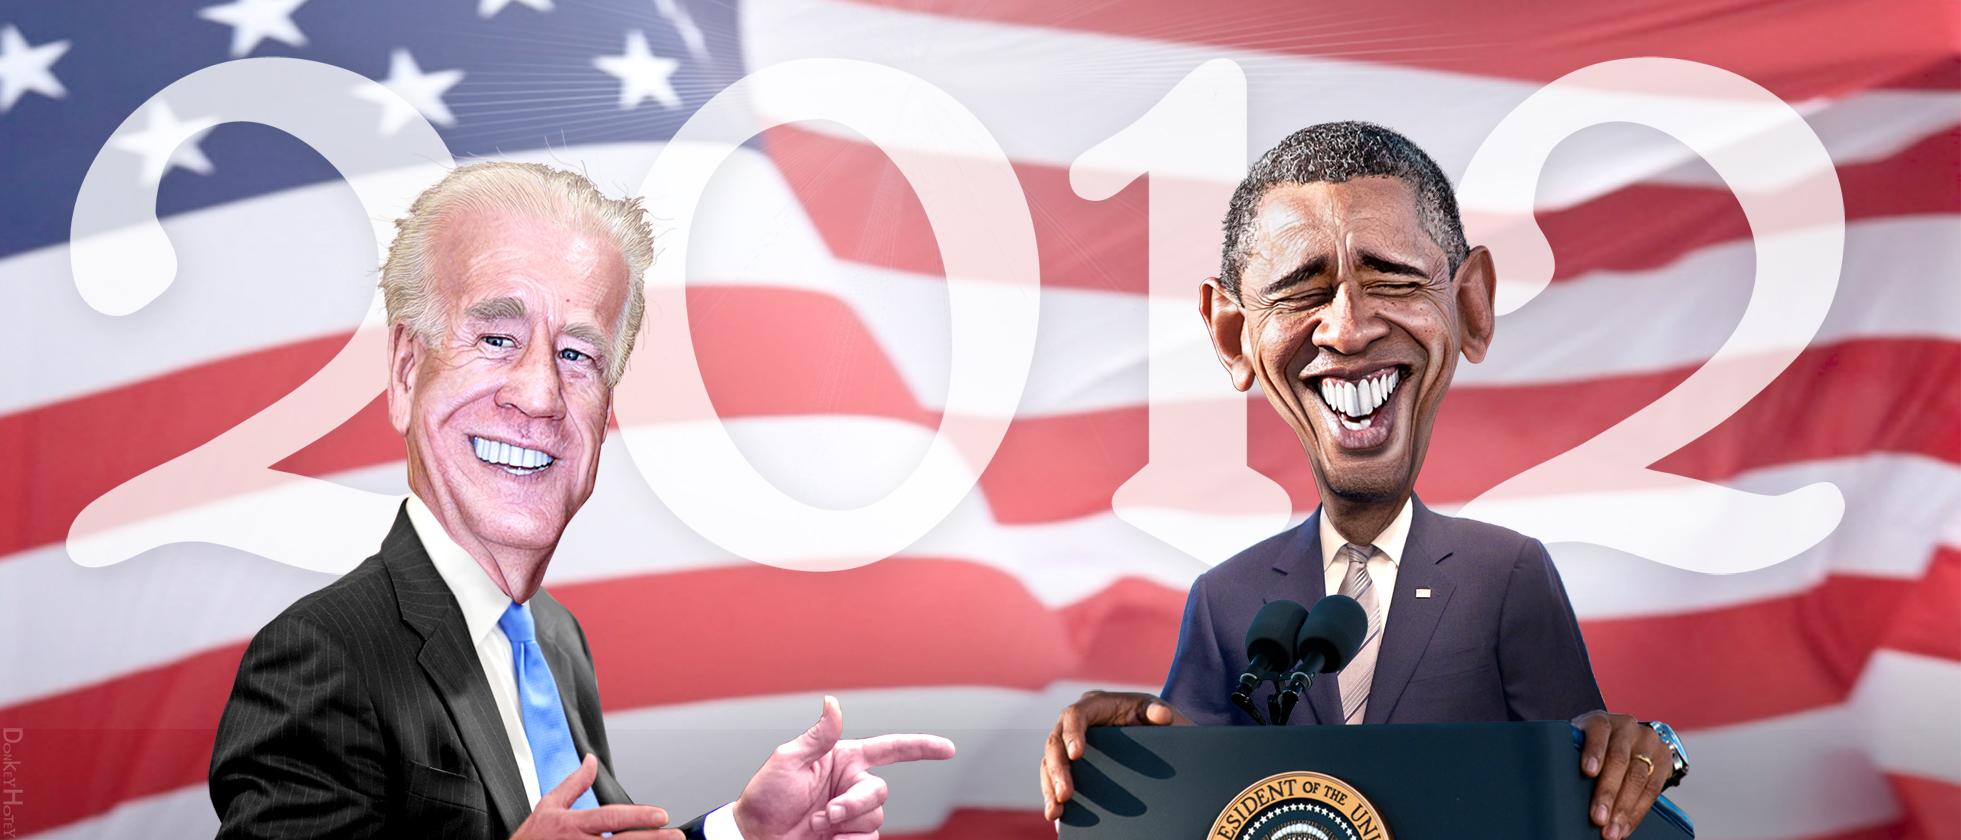 Is Obama Christen